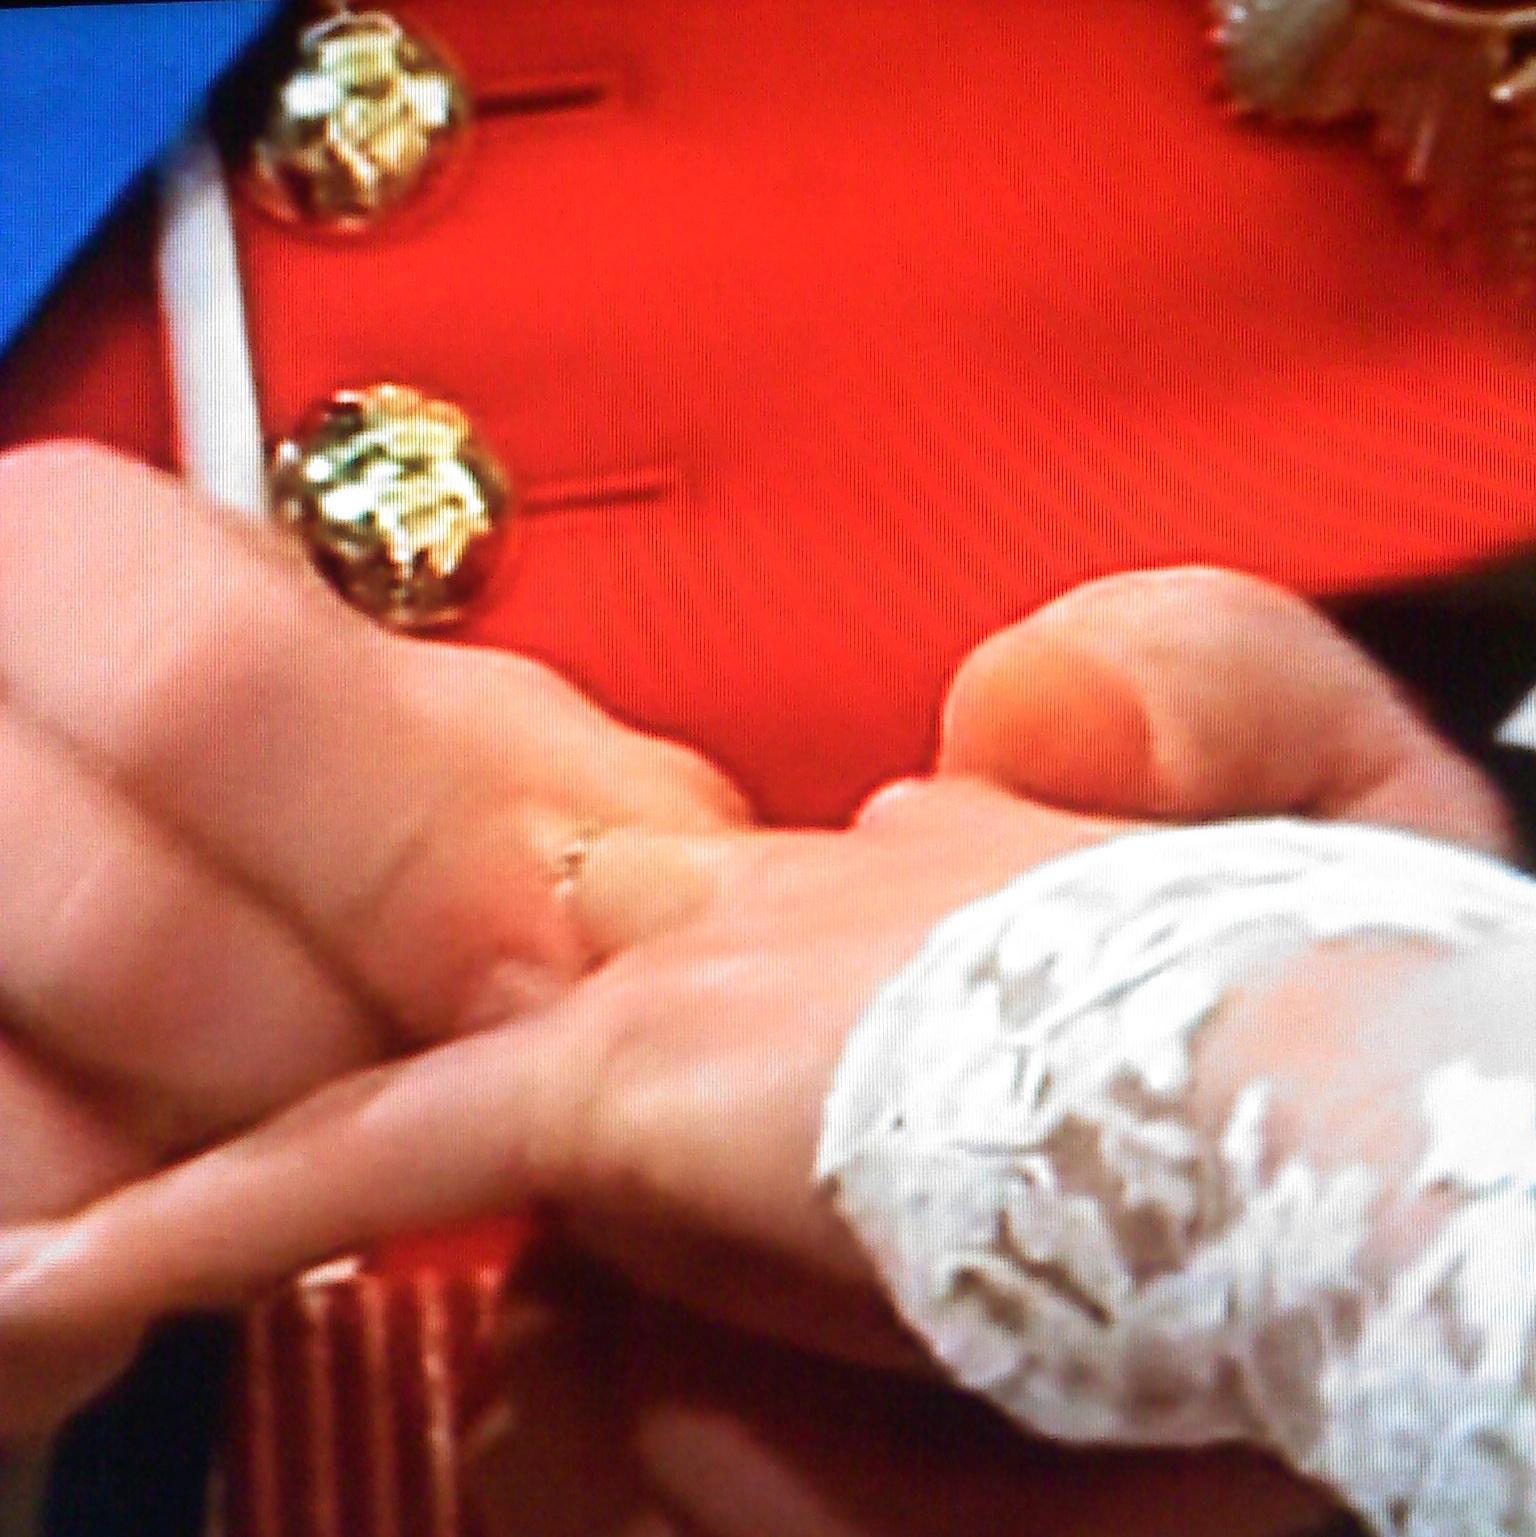 http://4.bp.blogspot.com/-DDQmPPfvpe0/TmBJ_NA7DsI/AAAAAAAAA8w/0tcdkc9hUpw/s1600/Royal+Wedding_Ring+%25282%2529.jpg